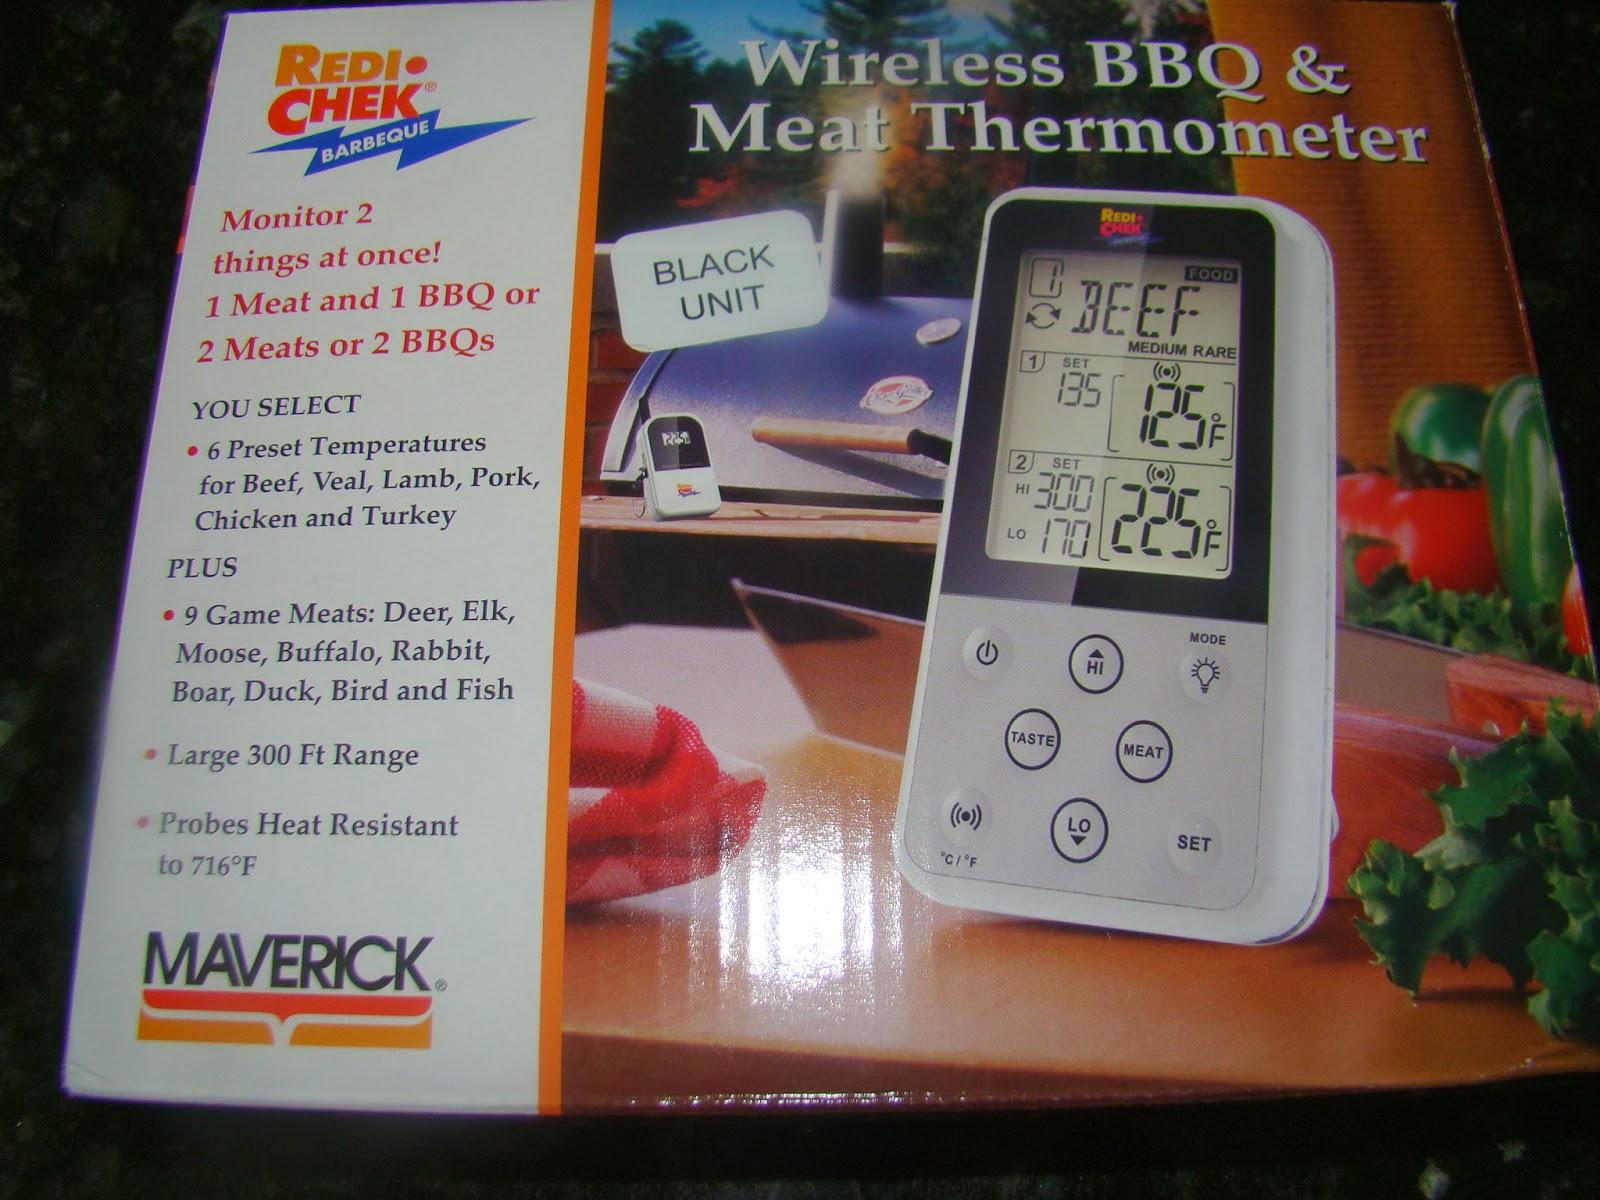 Kamado Joe Grilling Passion The Maverick Et 733 Wireless Bbq Meat